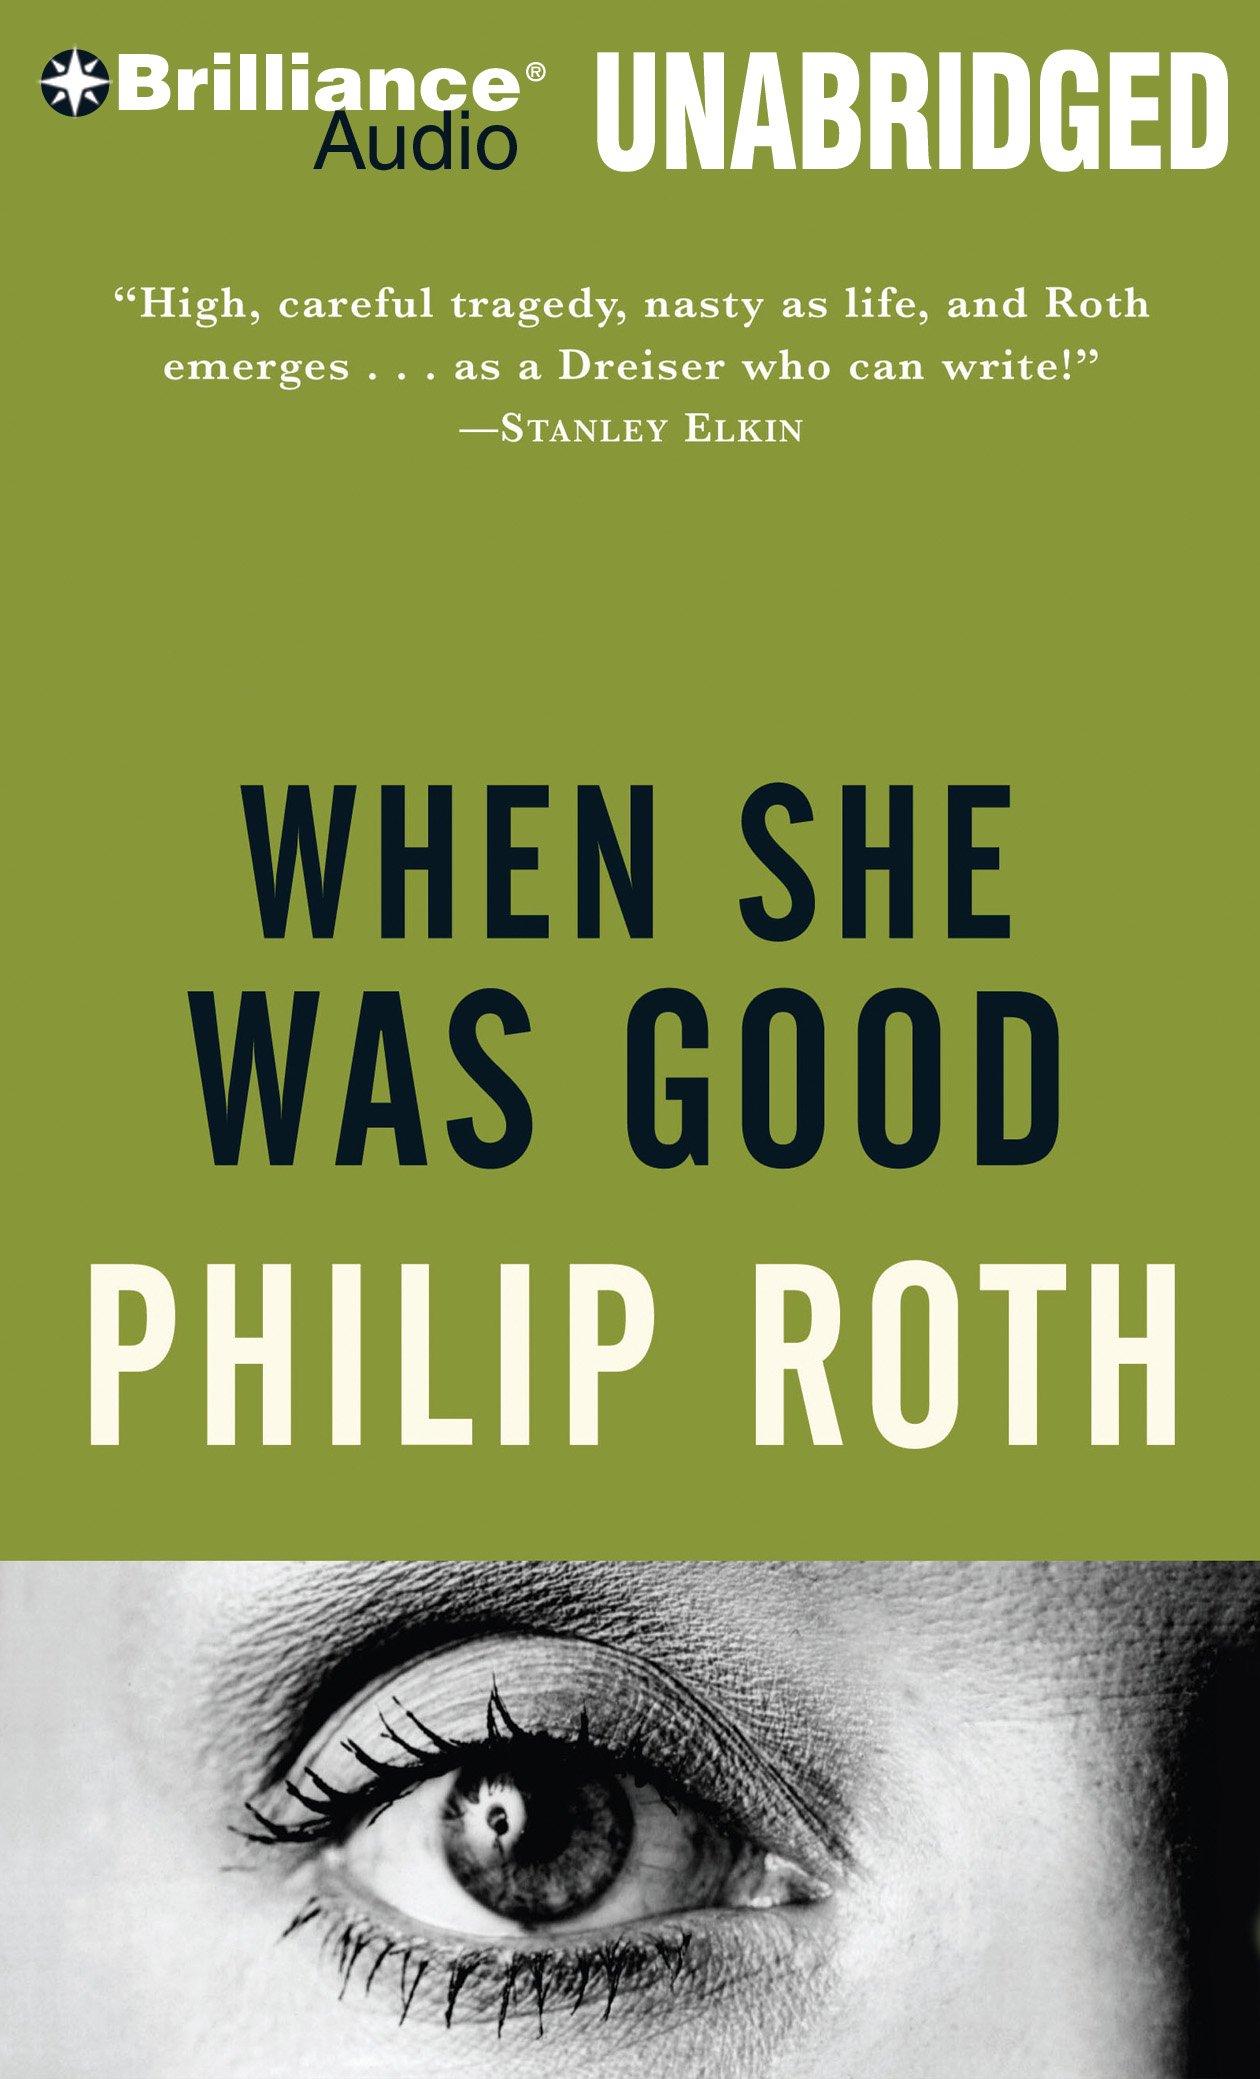 When She Was Good: Philip Roth, Tanya Eby: 9781455847839: Amazon: Books